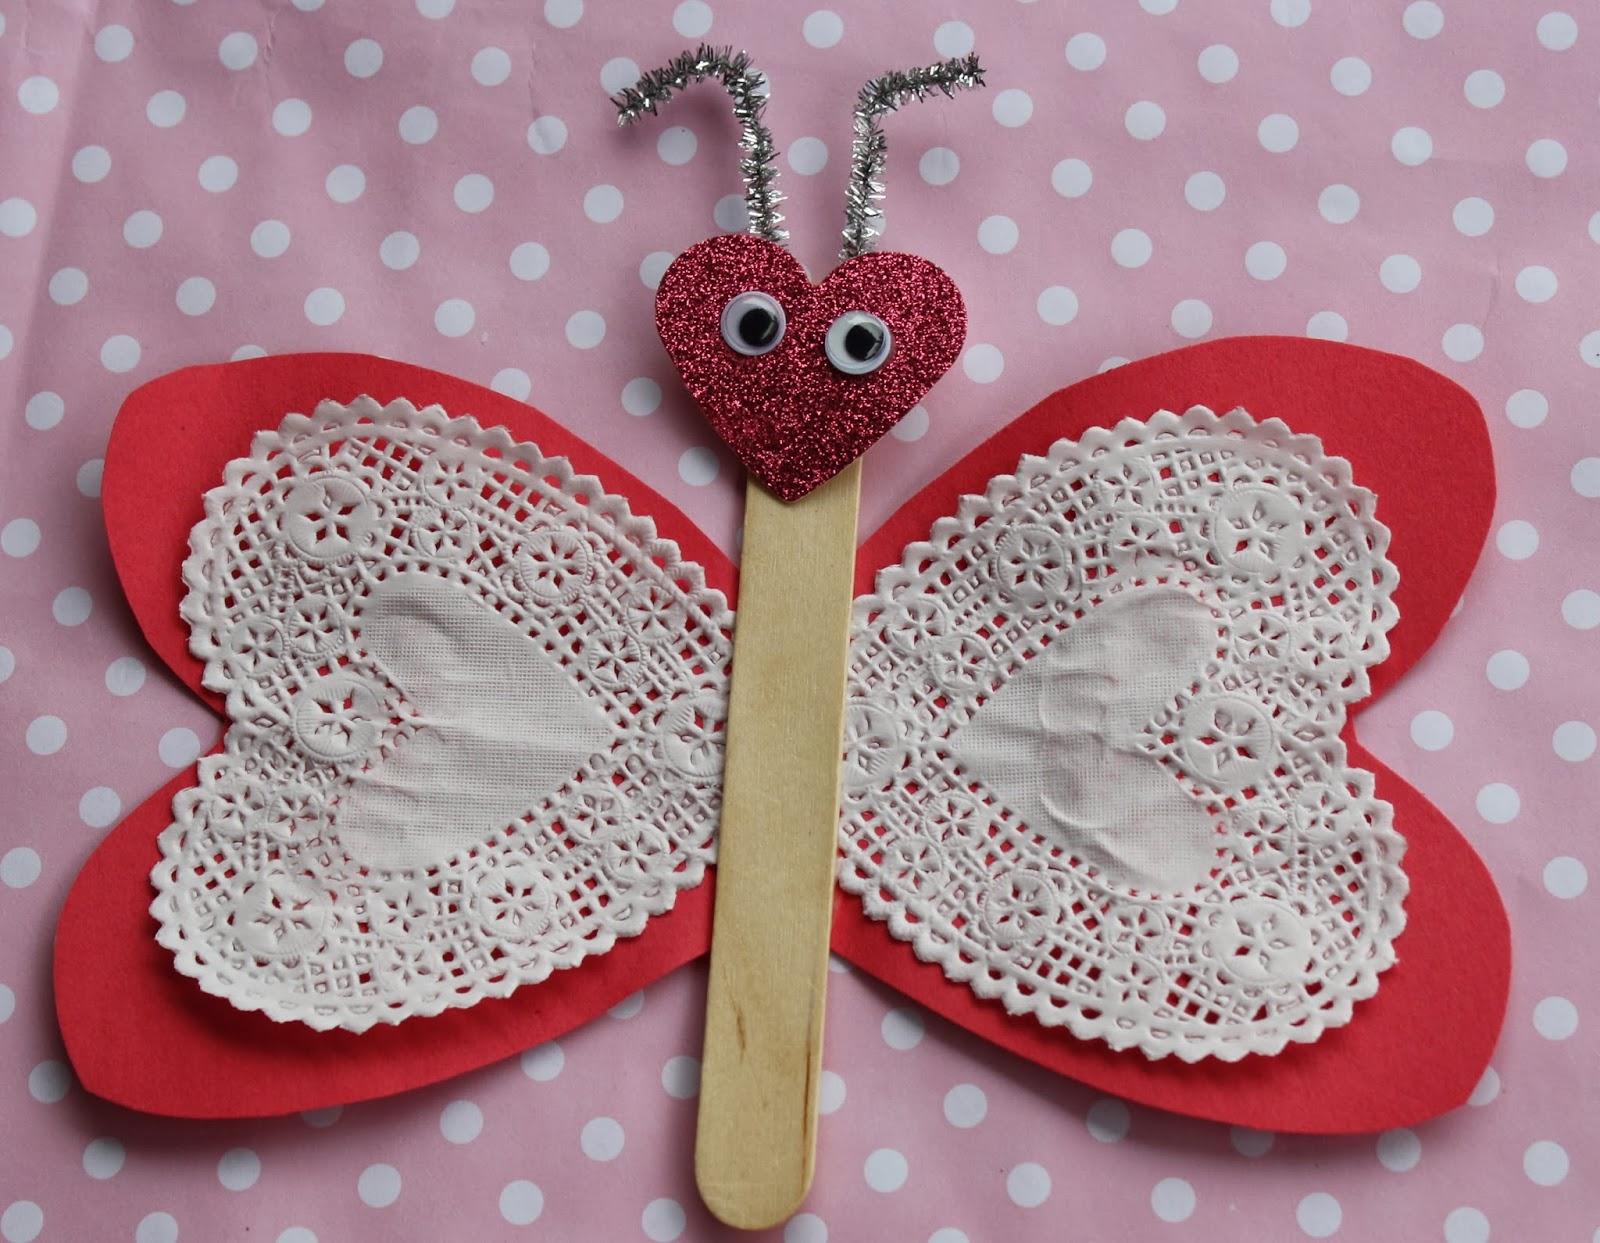 Crafts Using Heart Doilies